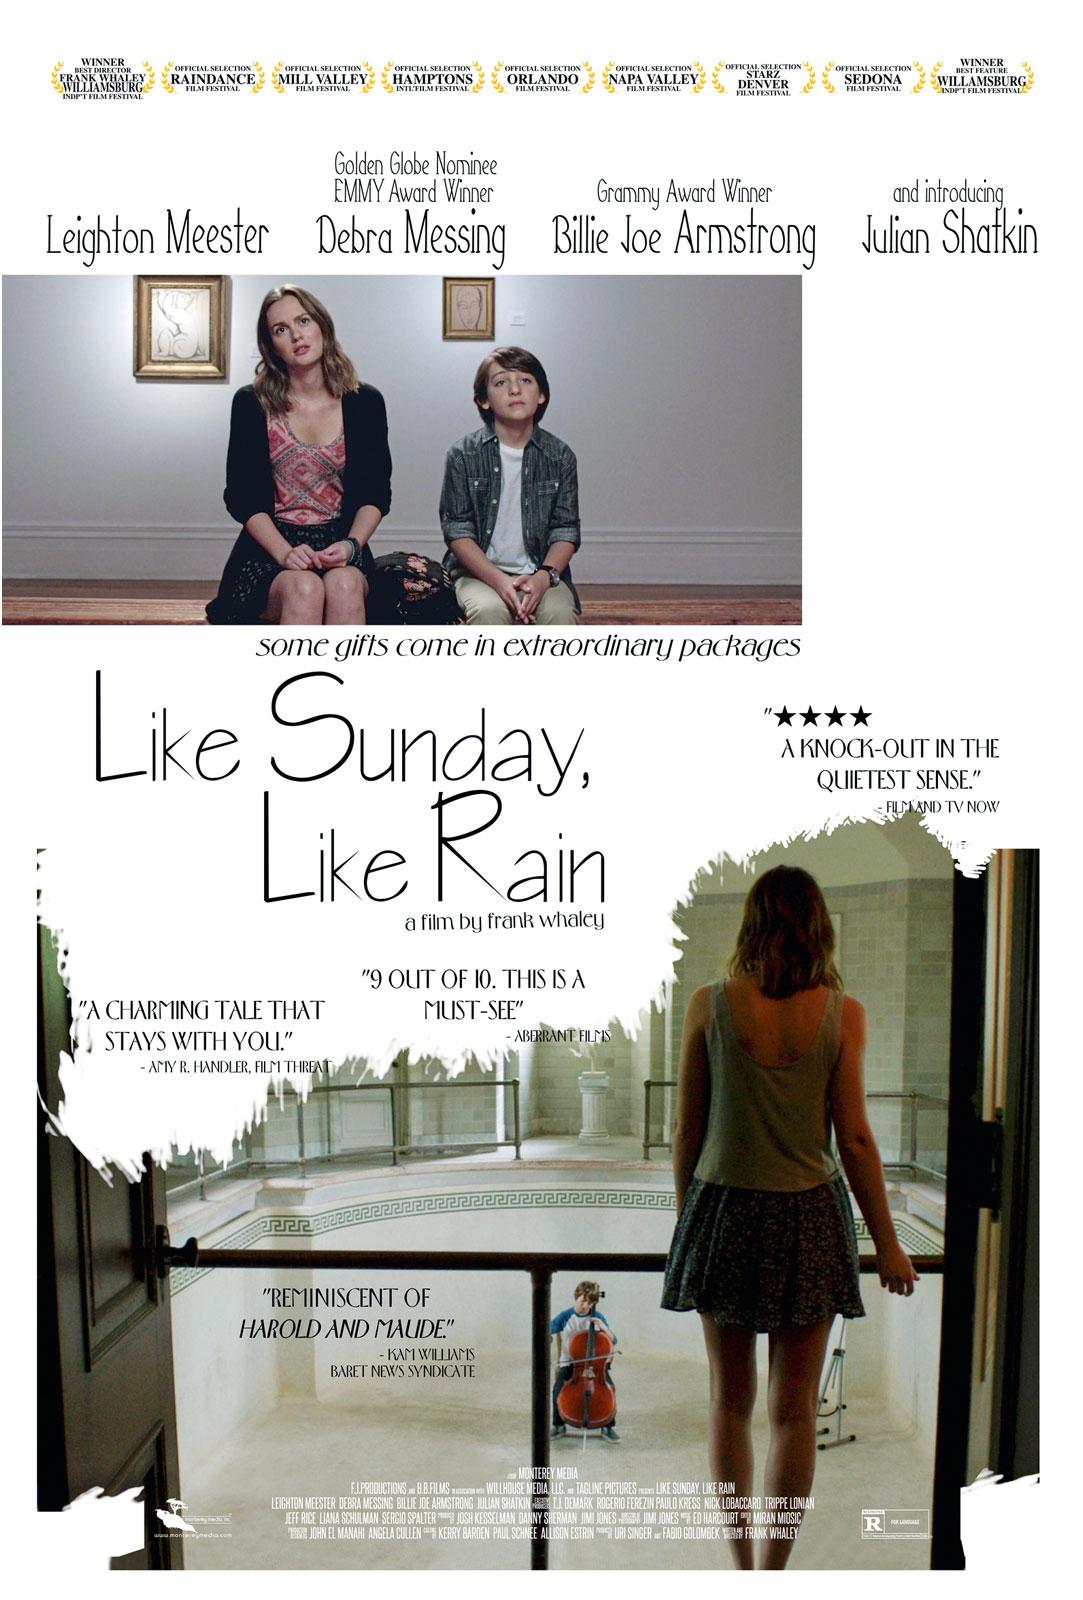 affiche du film Like Sunday, Like Rain